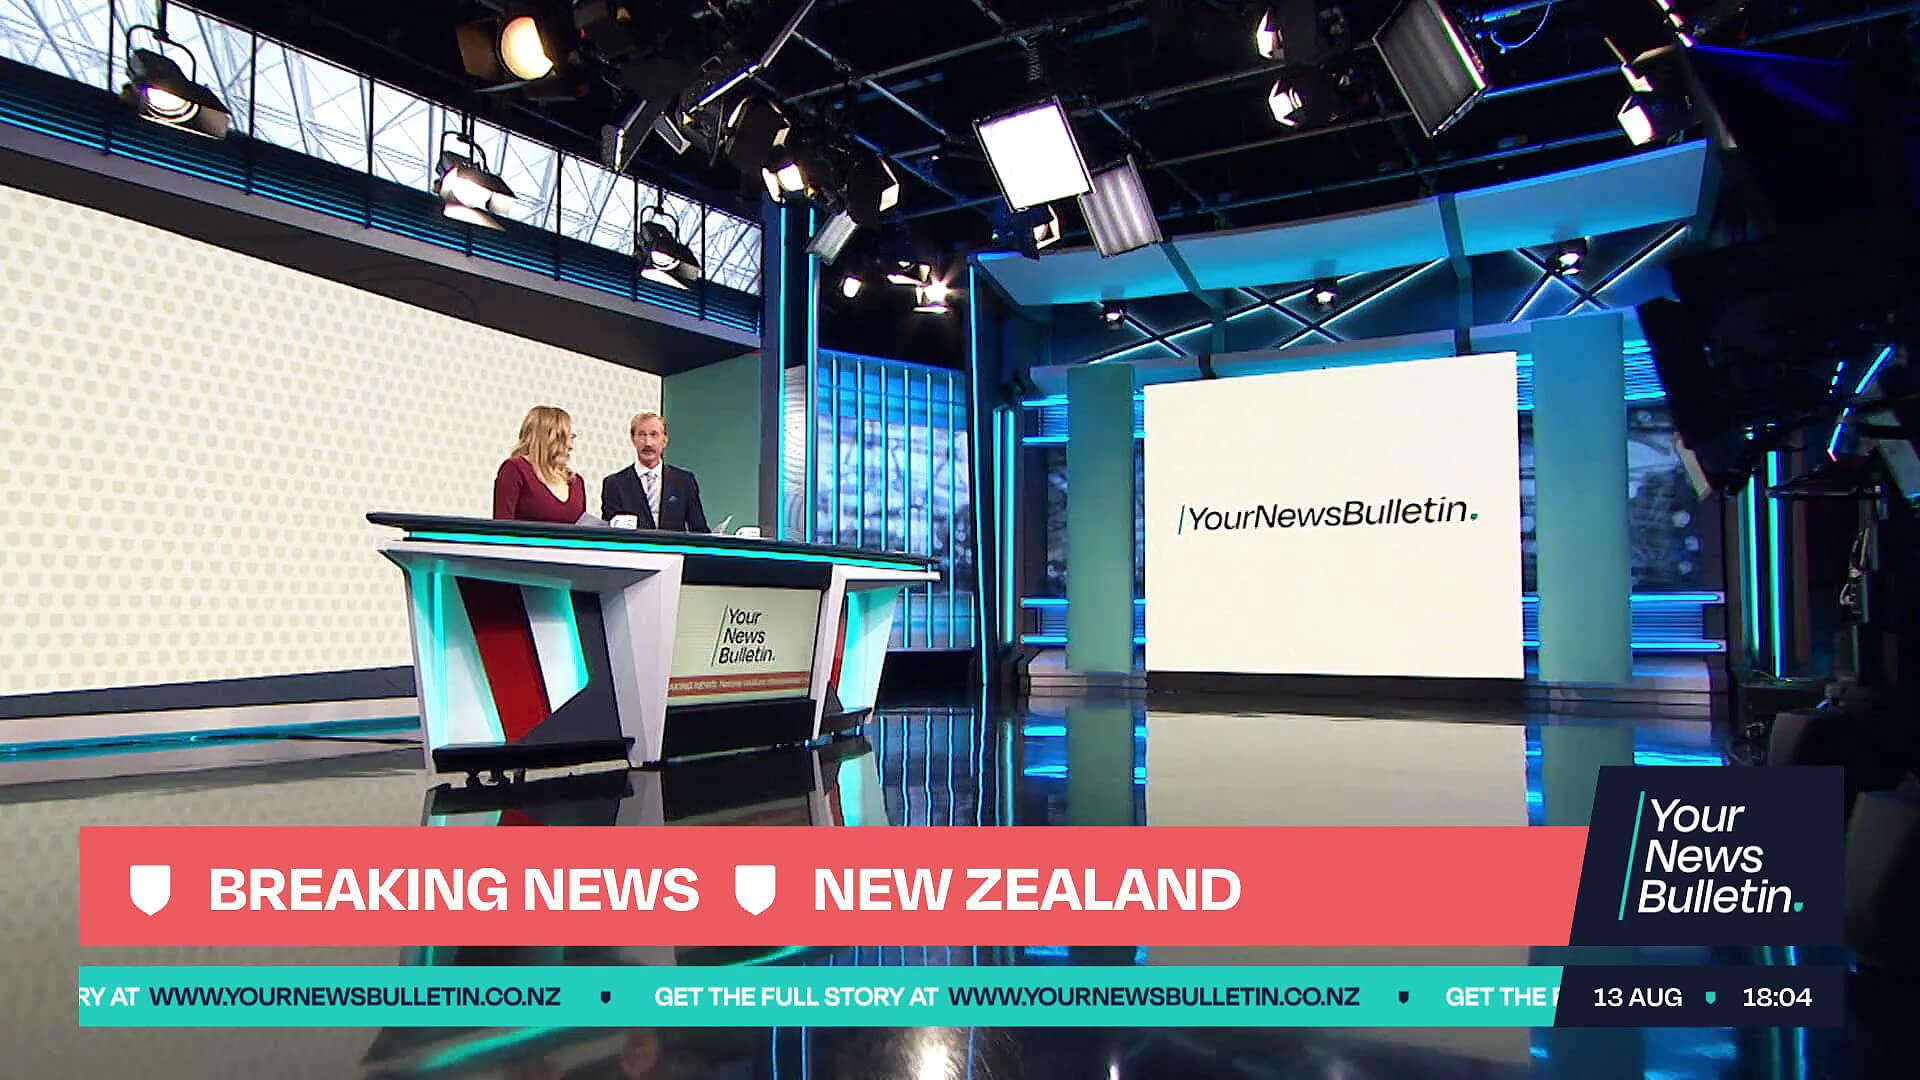 Your News Bulletin